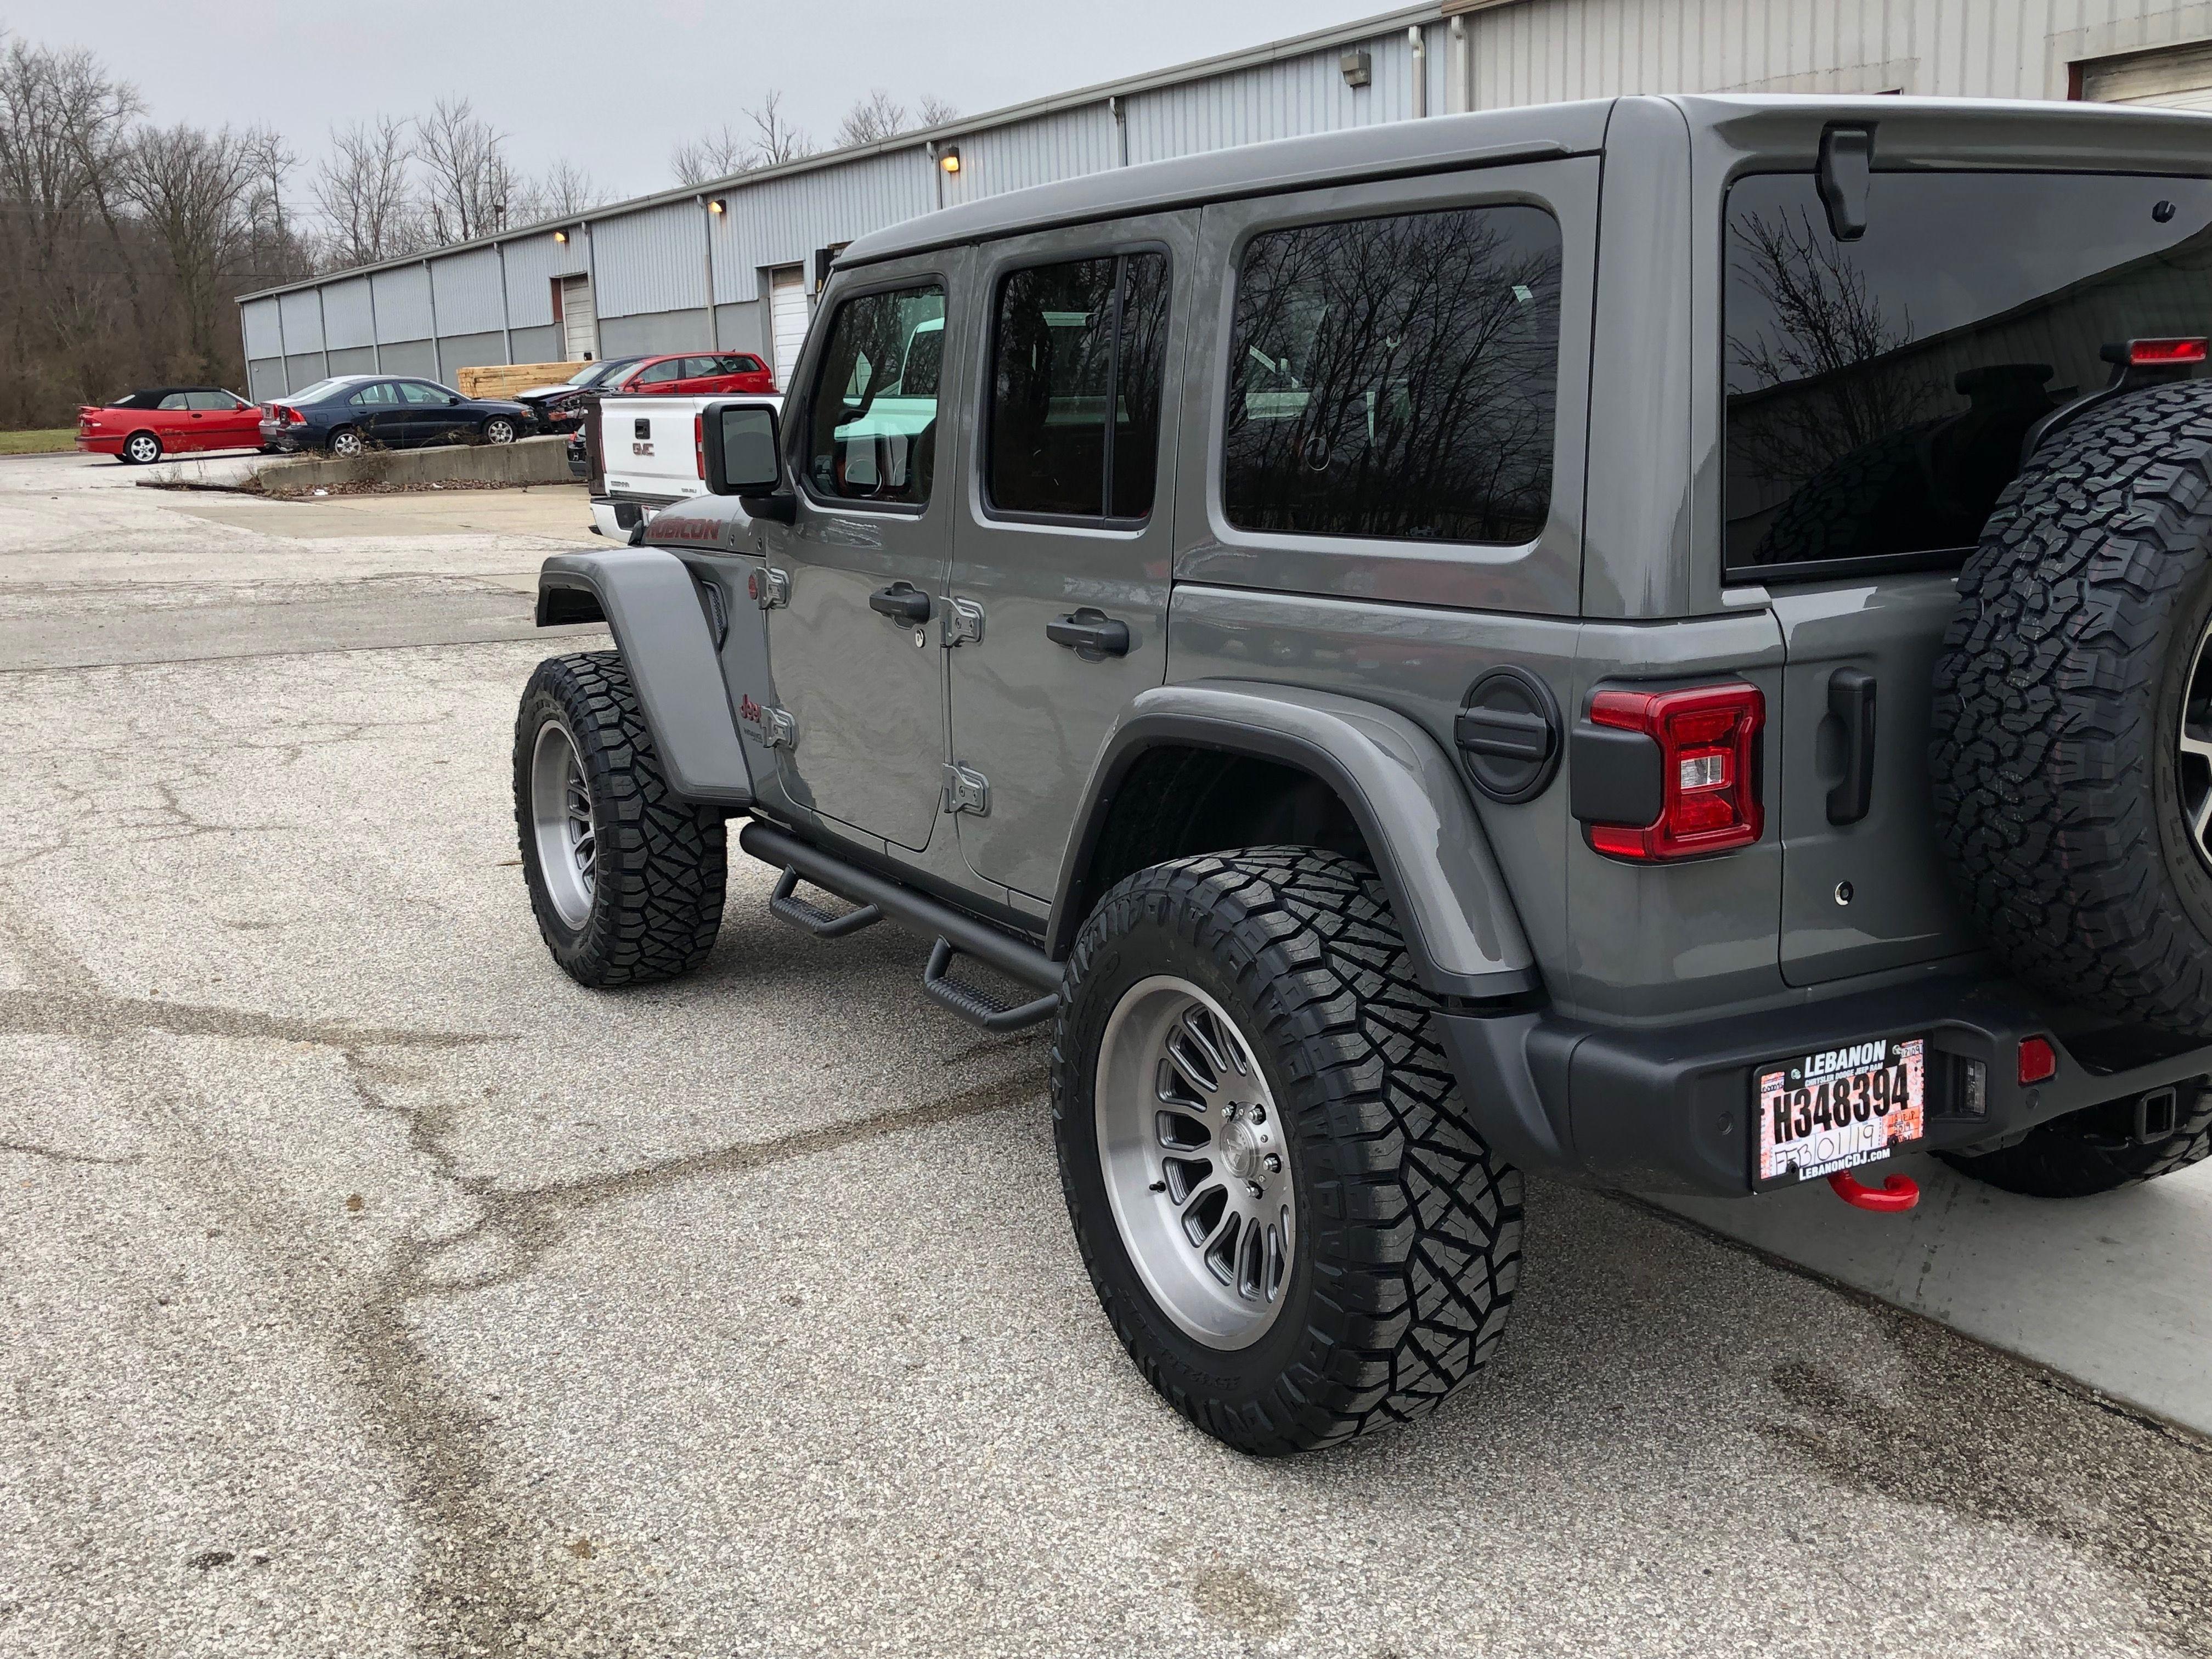 2019 Jeep Wrangler Rubicon Jl Sting Gray Jeep Jeep Wrangler